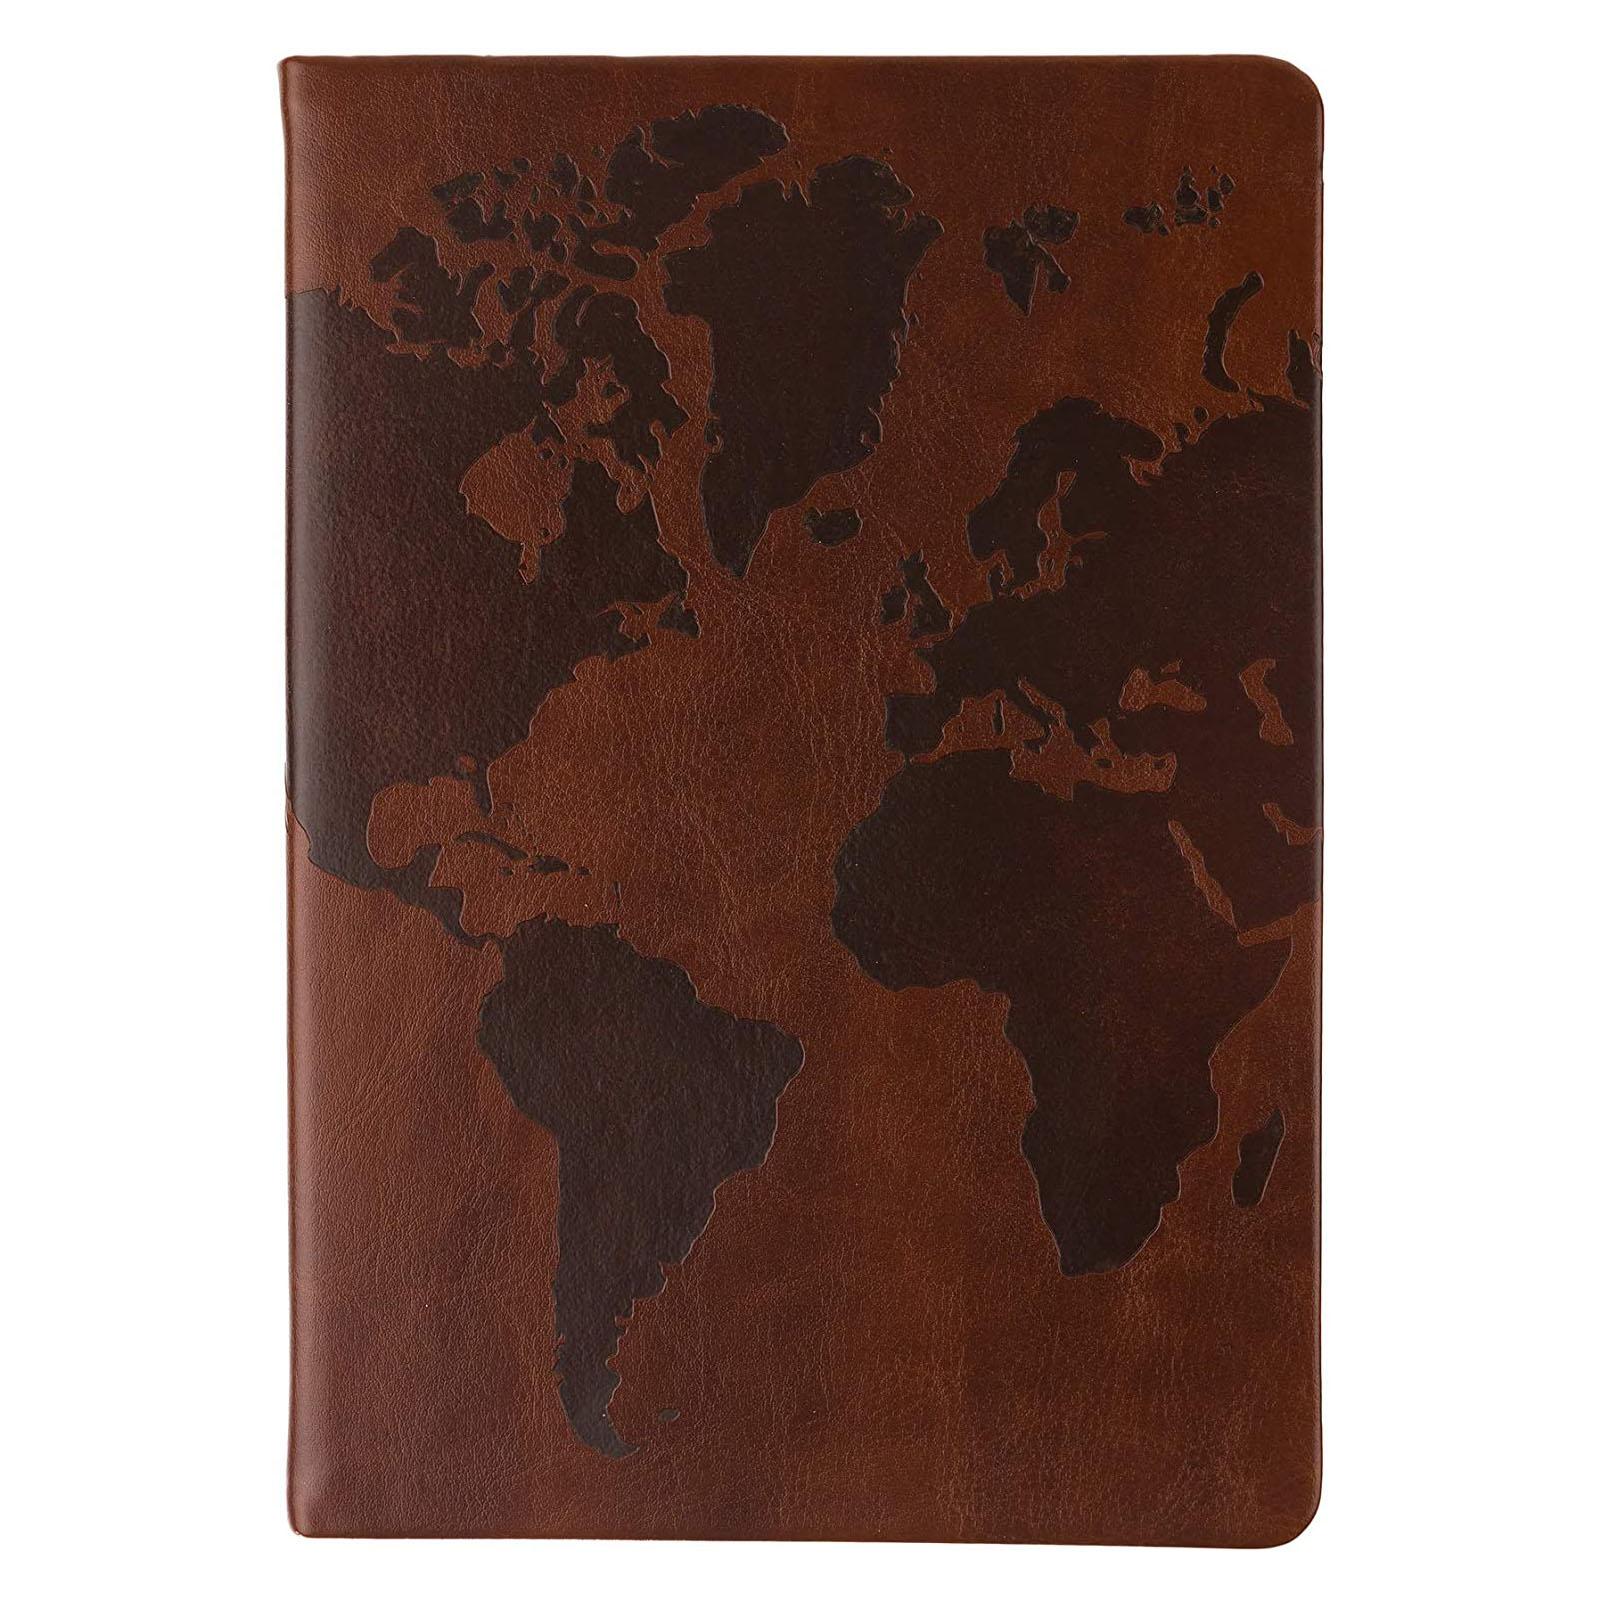 Eccolo World Traveler Style Journal